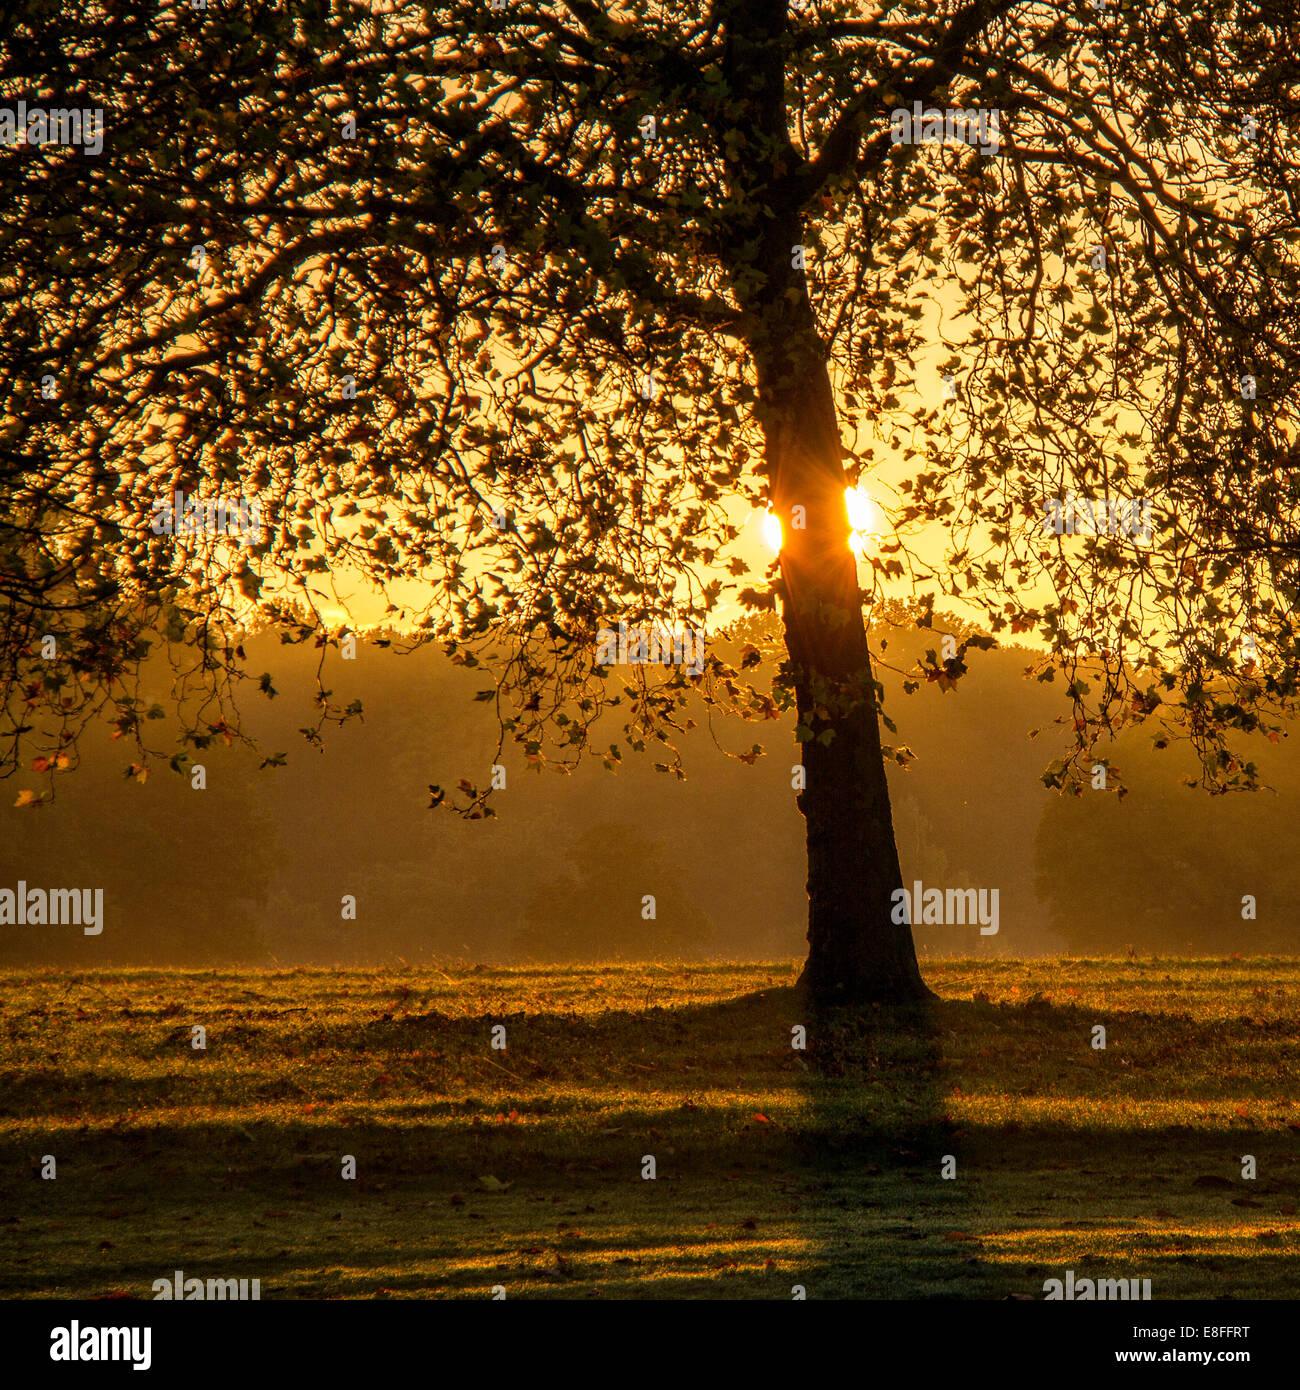 Backlit tree in park - Stock Image